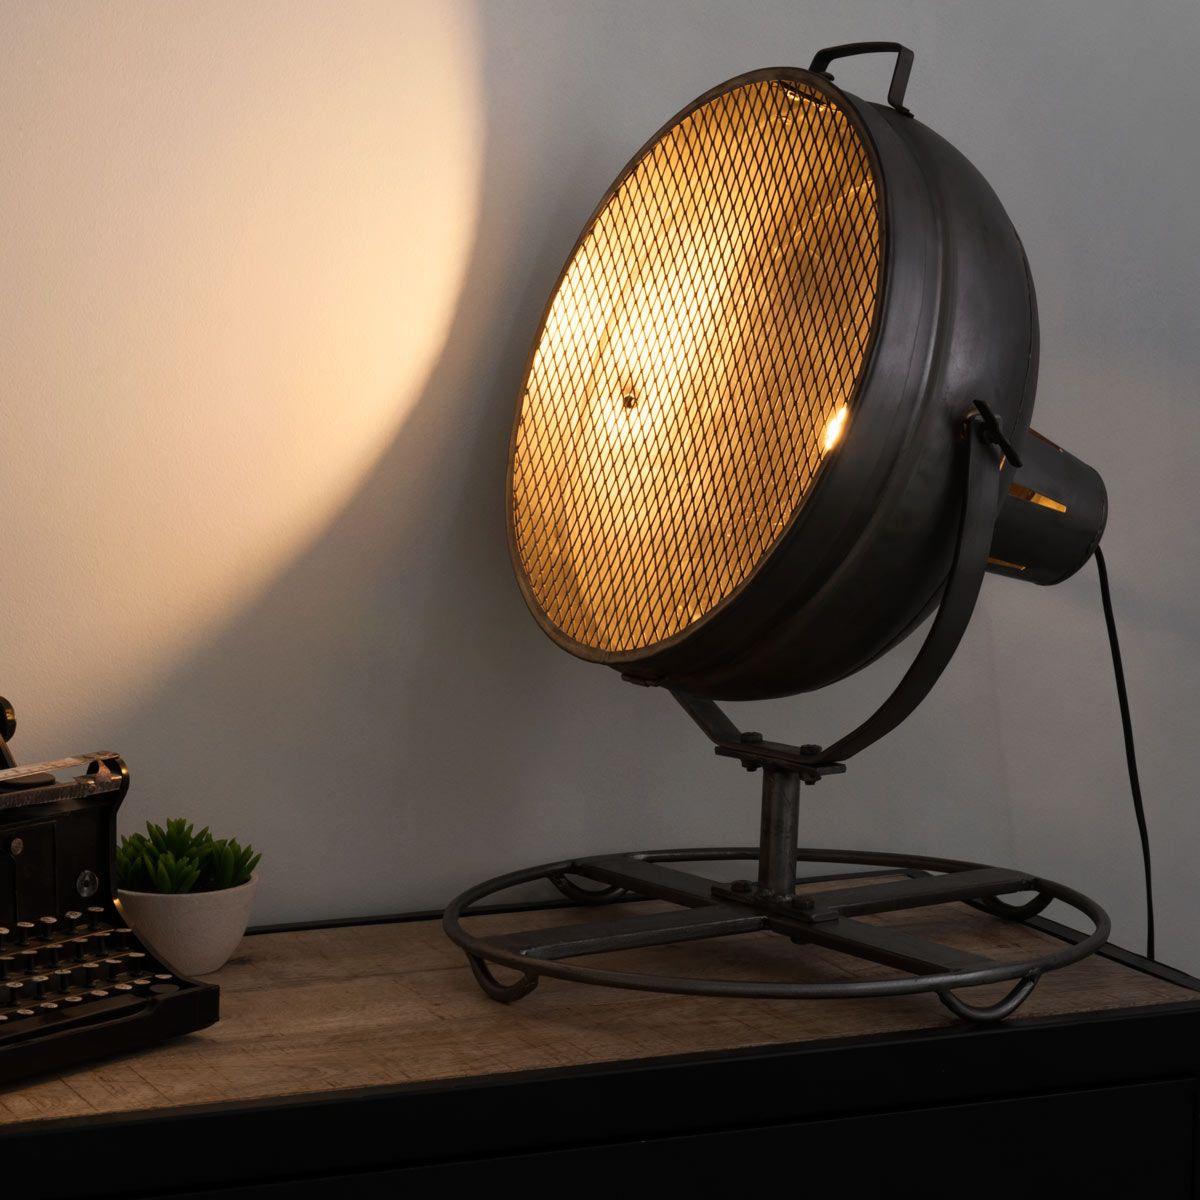 Lampe Orientable En Metal H 60 Cm Phare Maisons Du Monde Lampe Phare Lampe Maison Du Monde